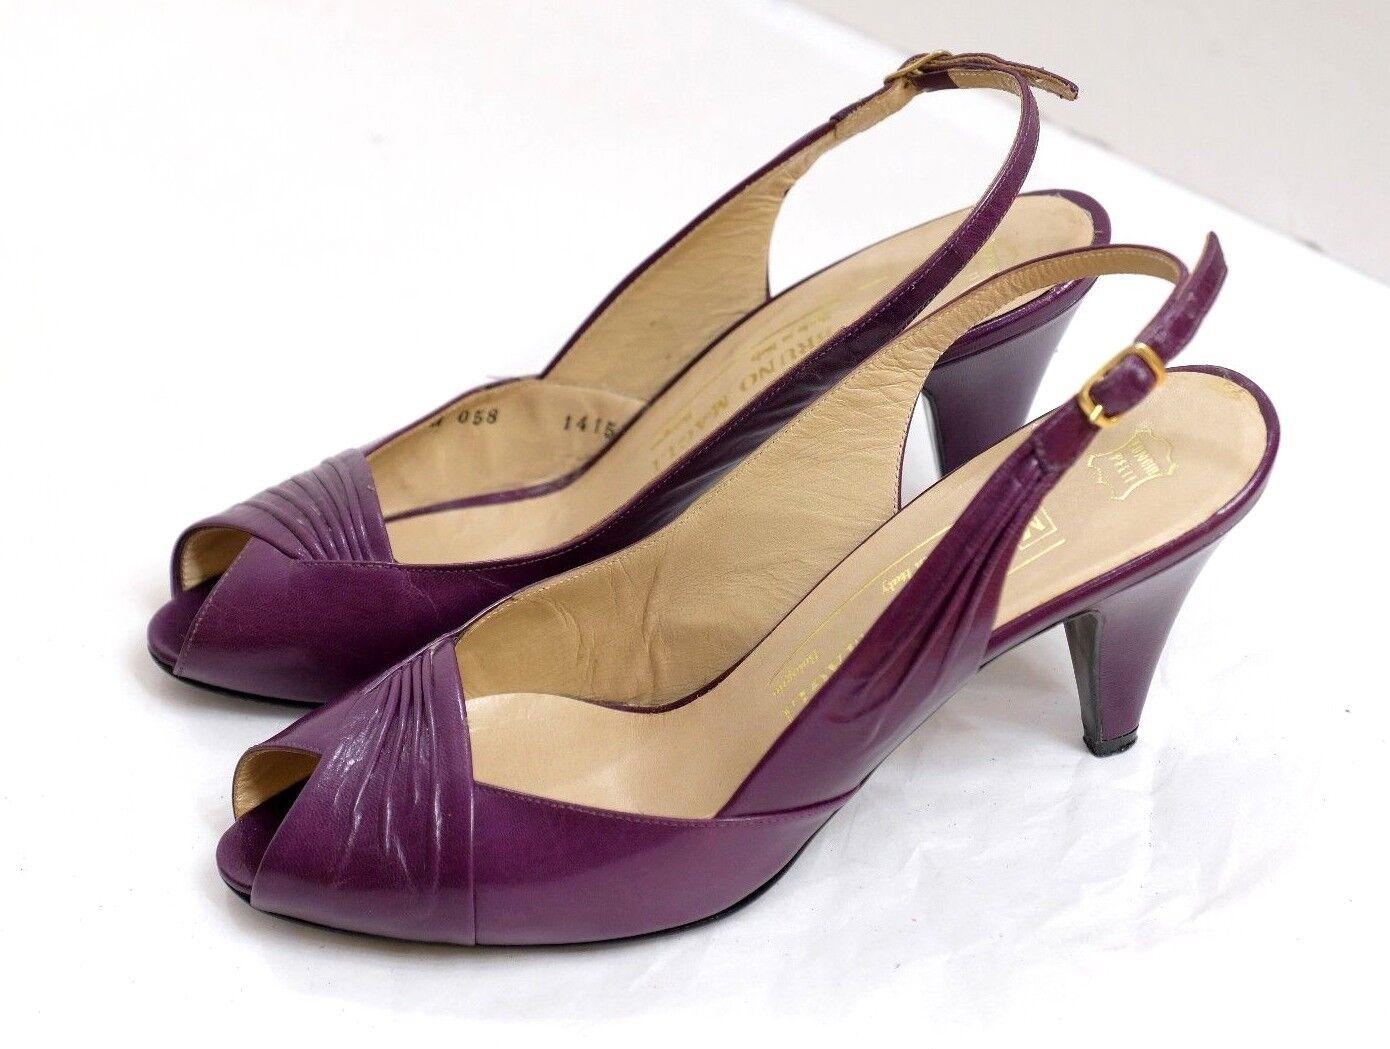 VGUC Bruno Magli Women's Size 6B Stylish Purple Leather Open Toe Slingback Pumps